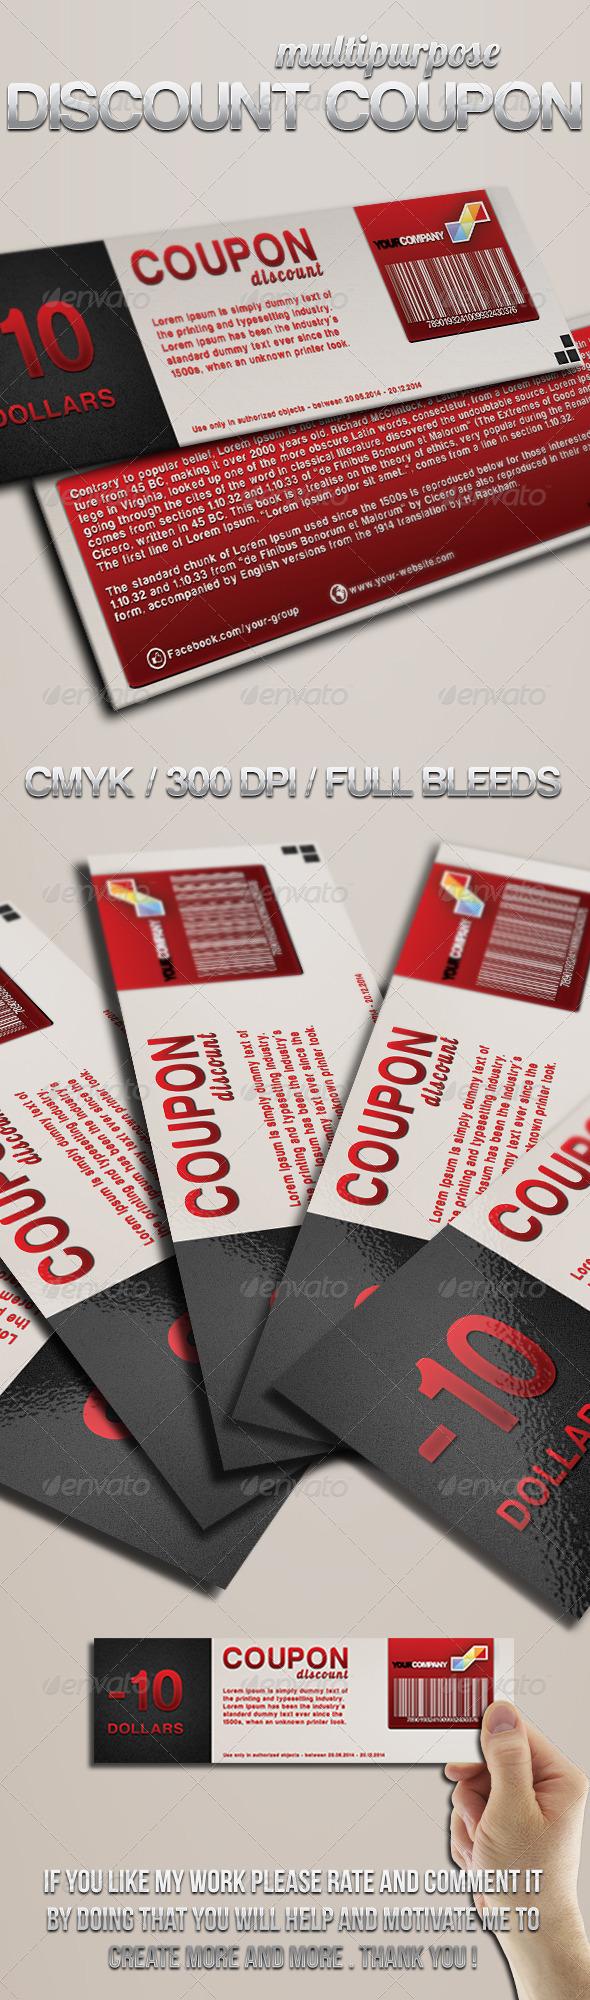 Multipurpose discount coupon - Cards & Invites Print Templates